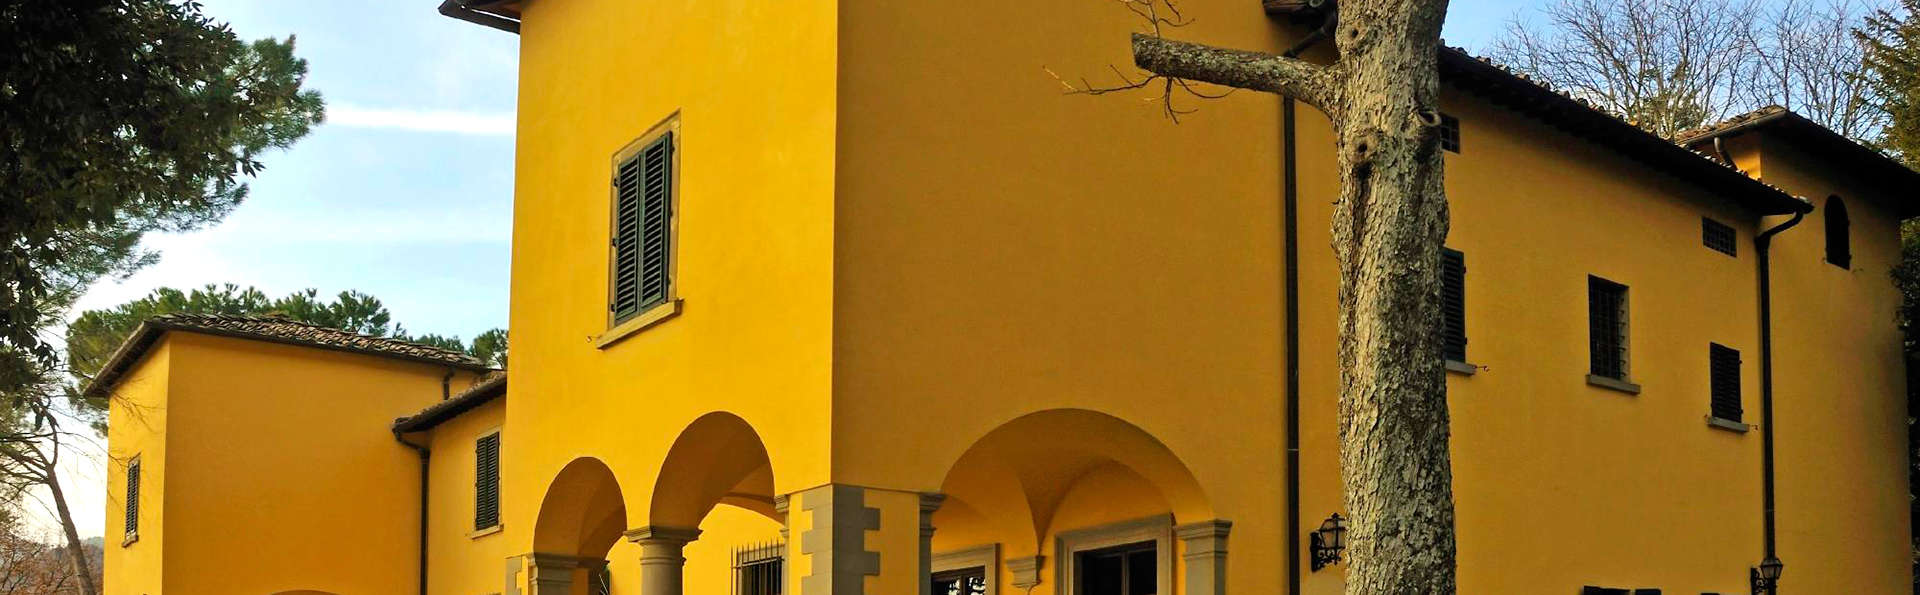 Il Trebbiolo Relais - EDIT_front2.jpg